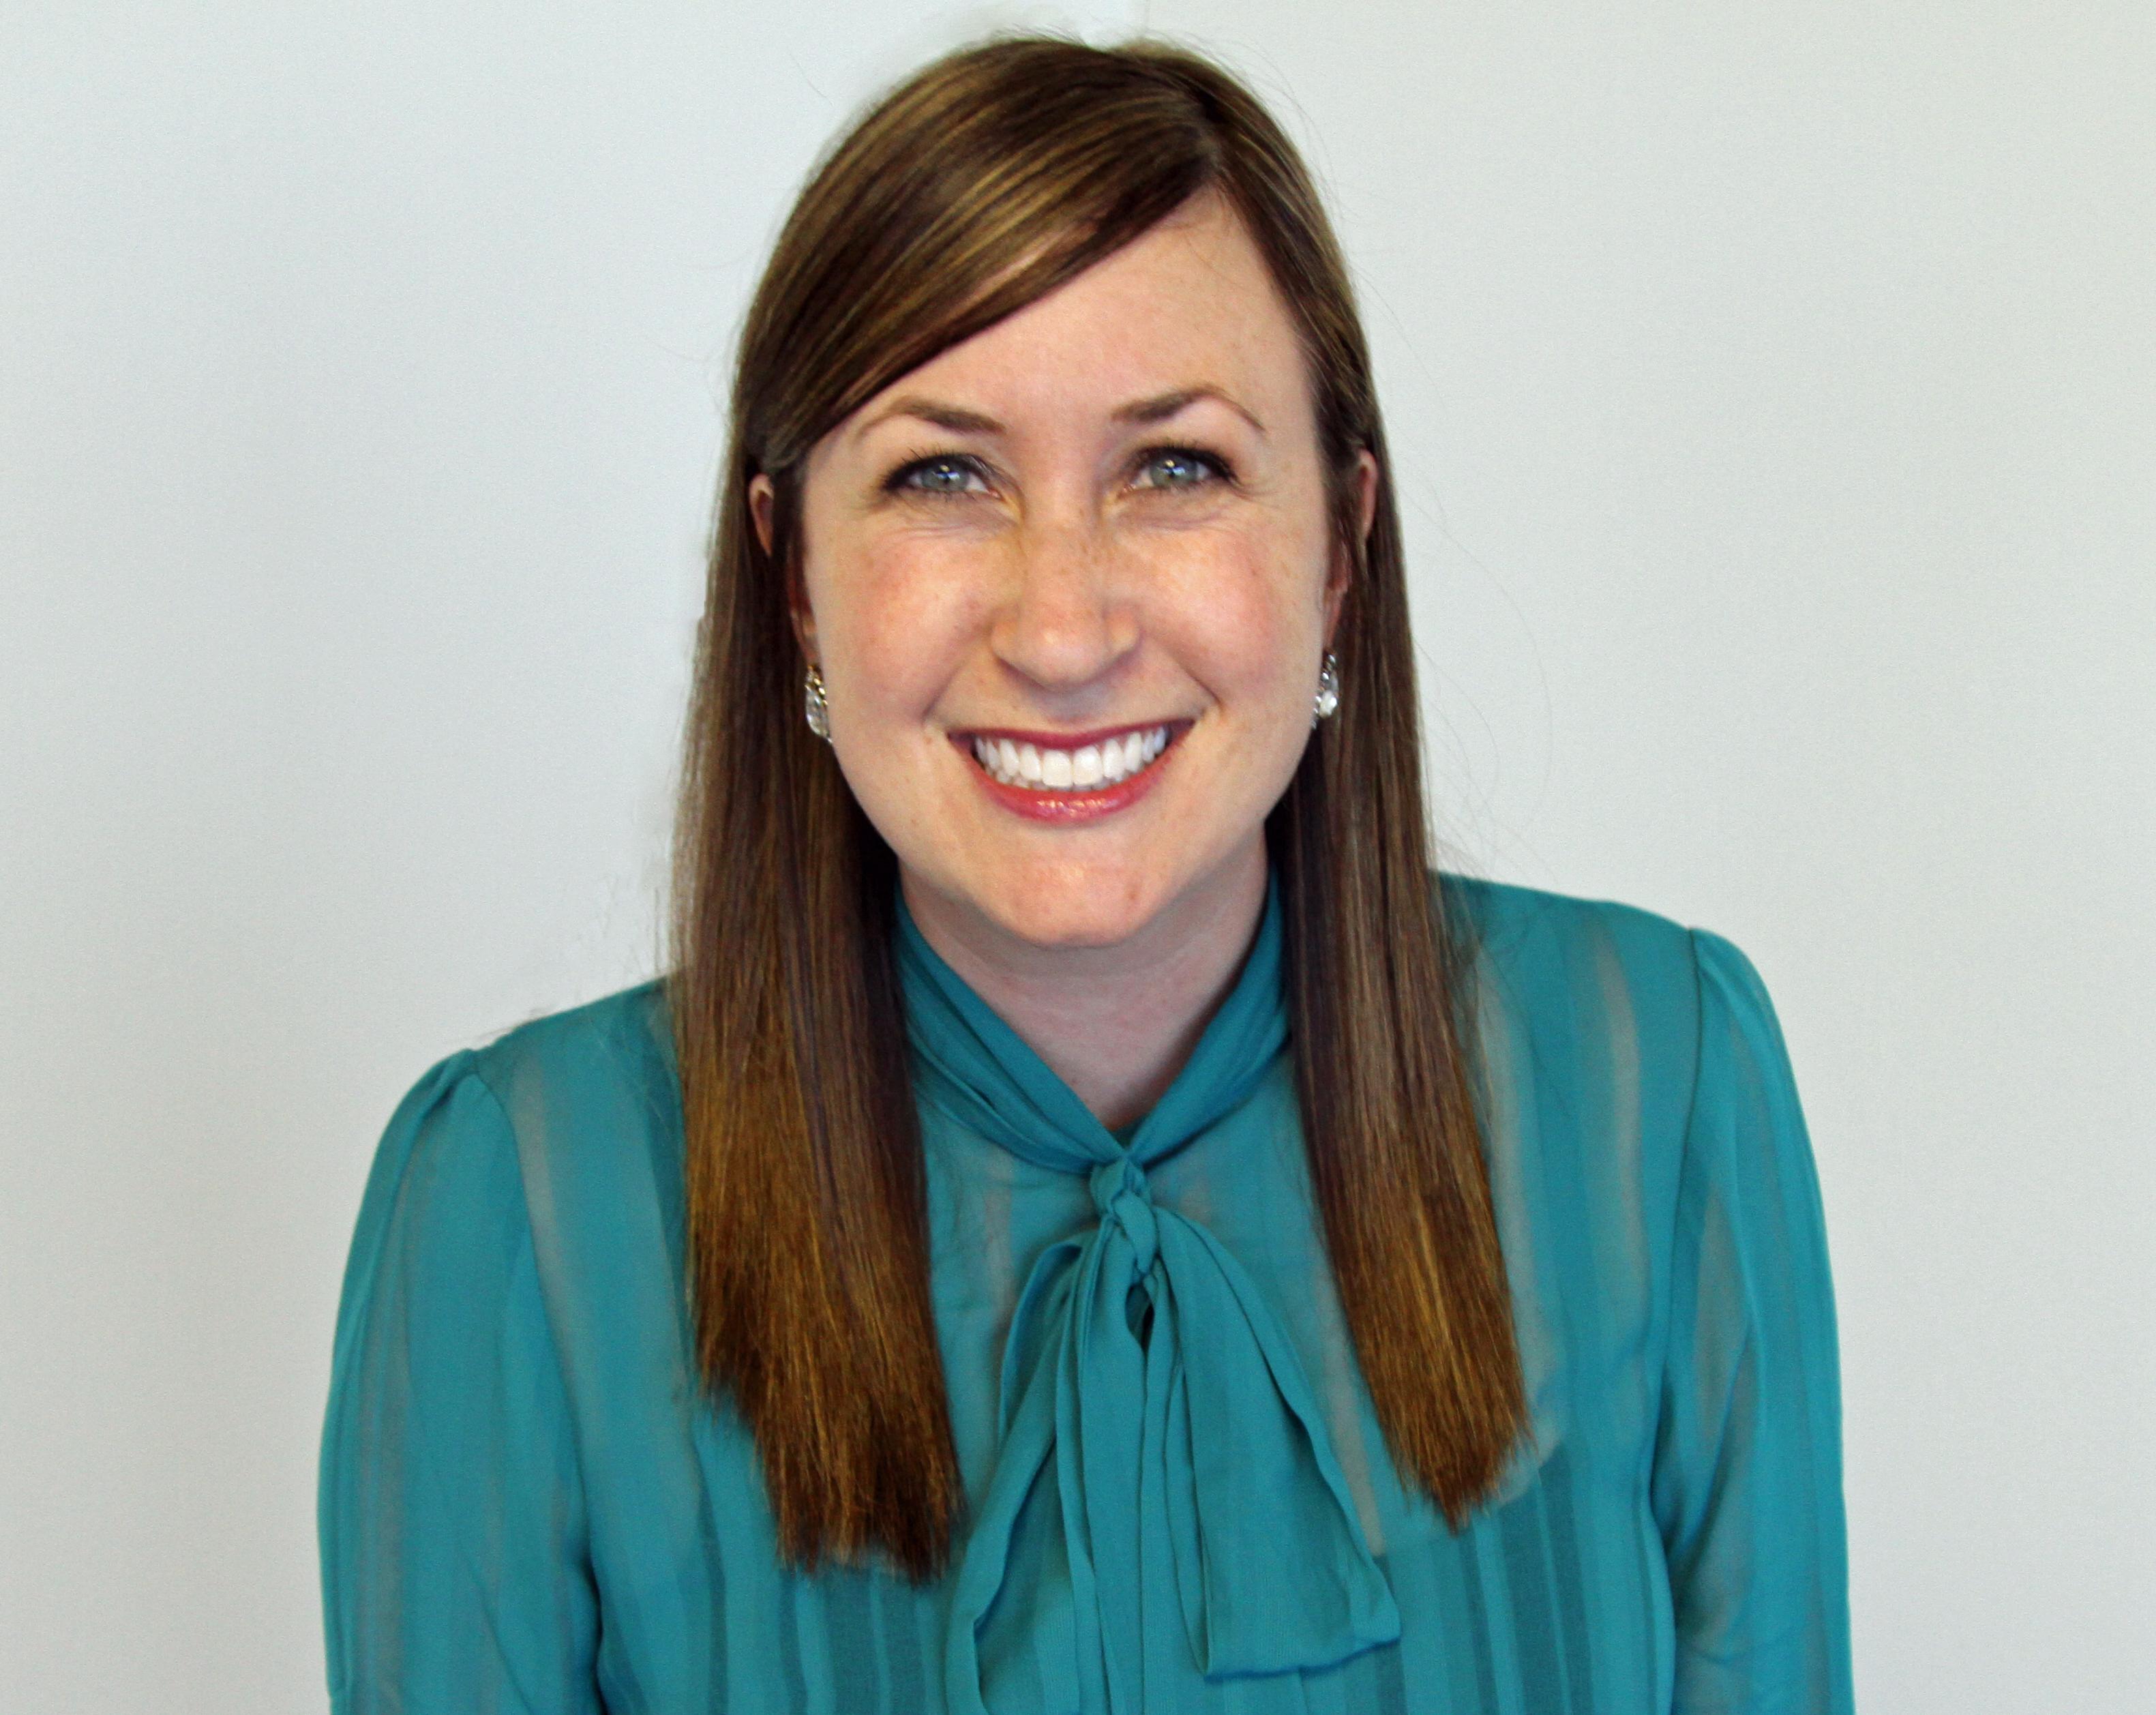 Rebecca Galloway